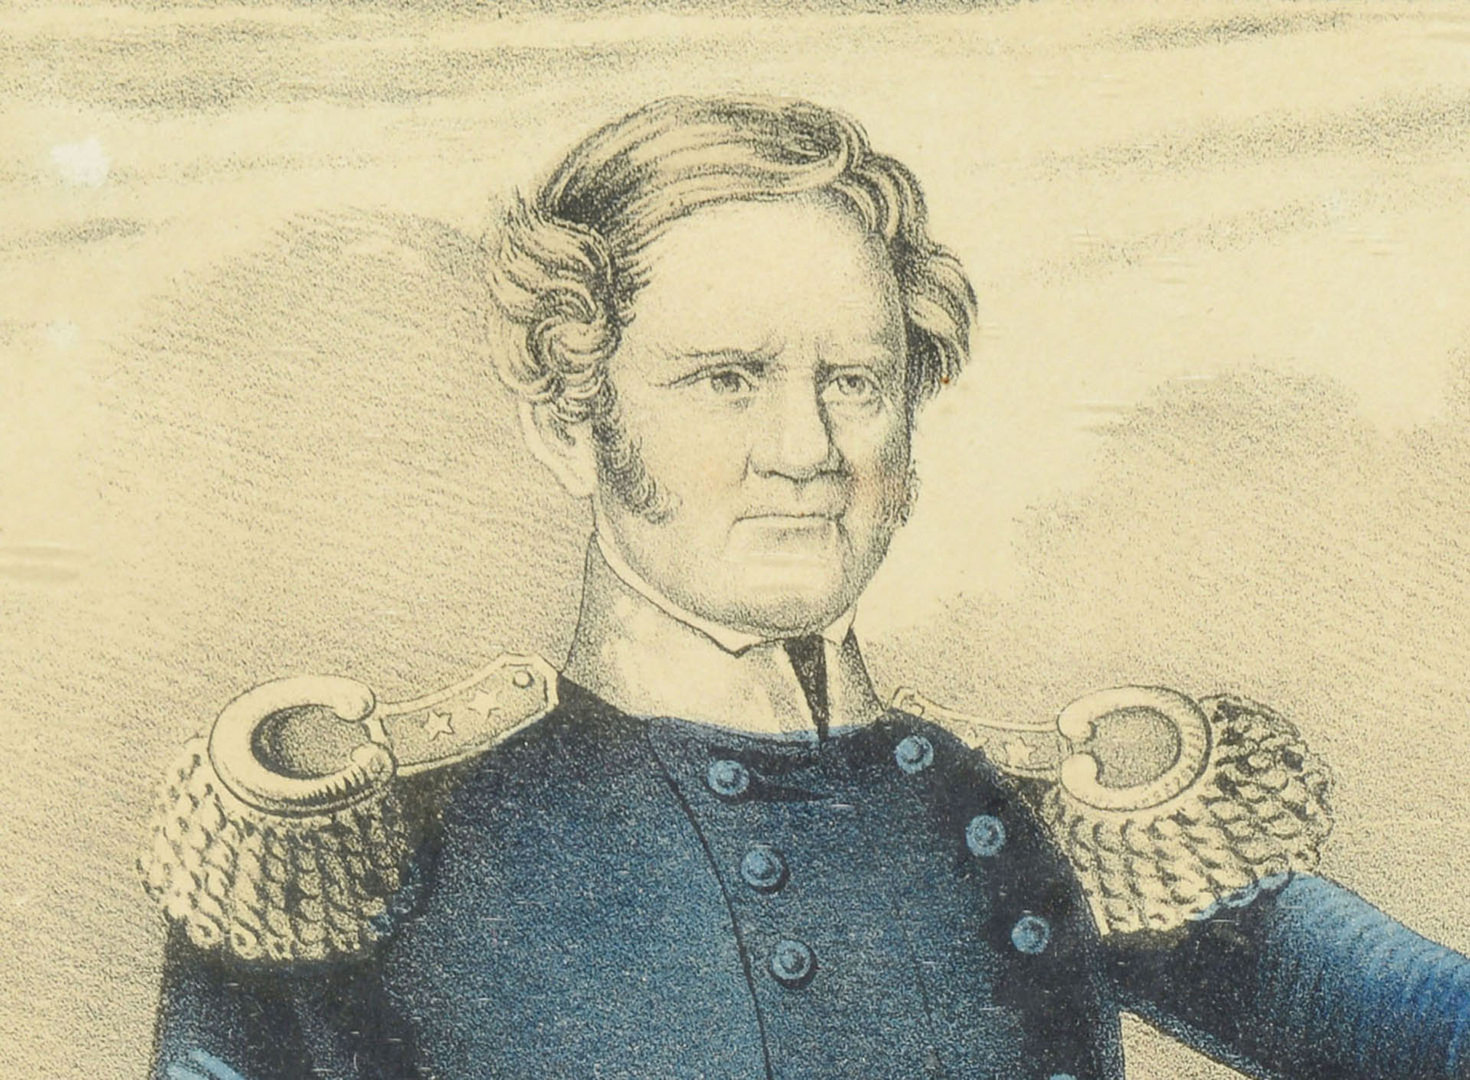 Lot 537: 1847 Currier & Ives Lithograph of Gen. Scott